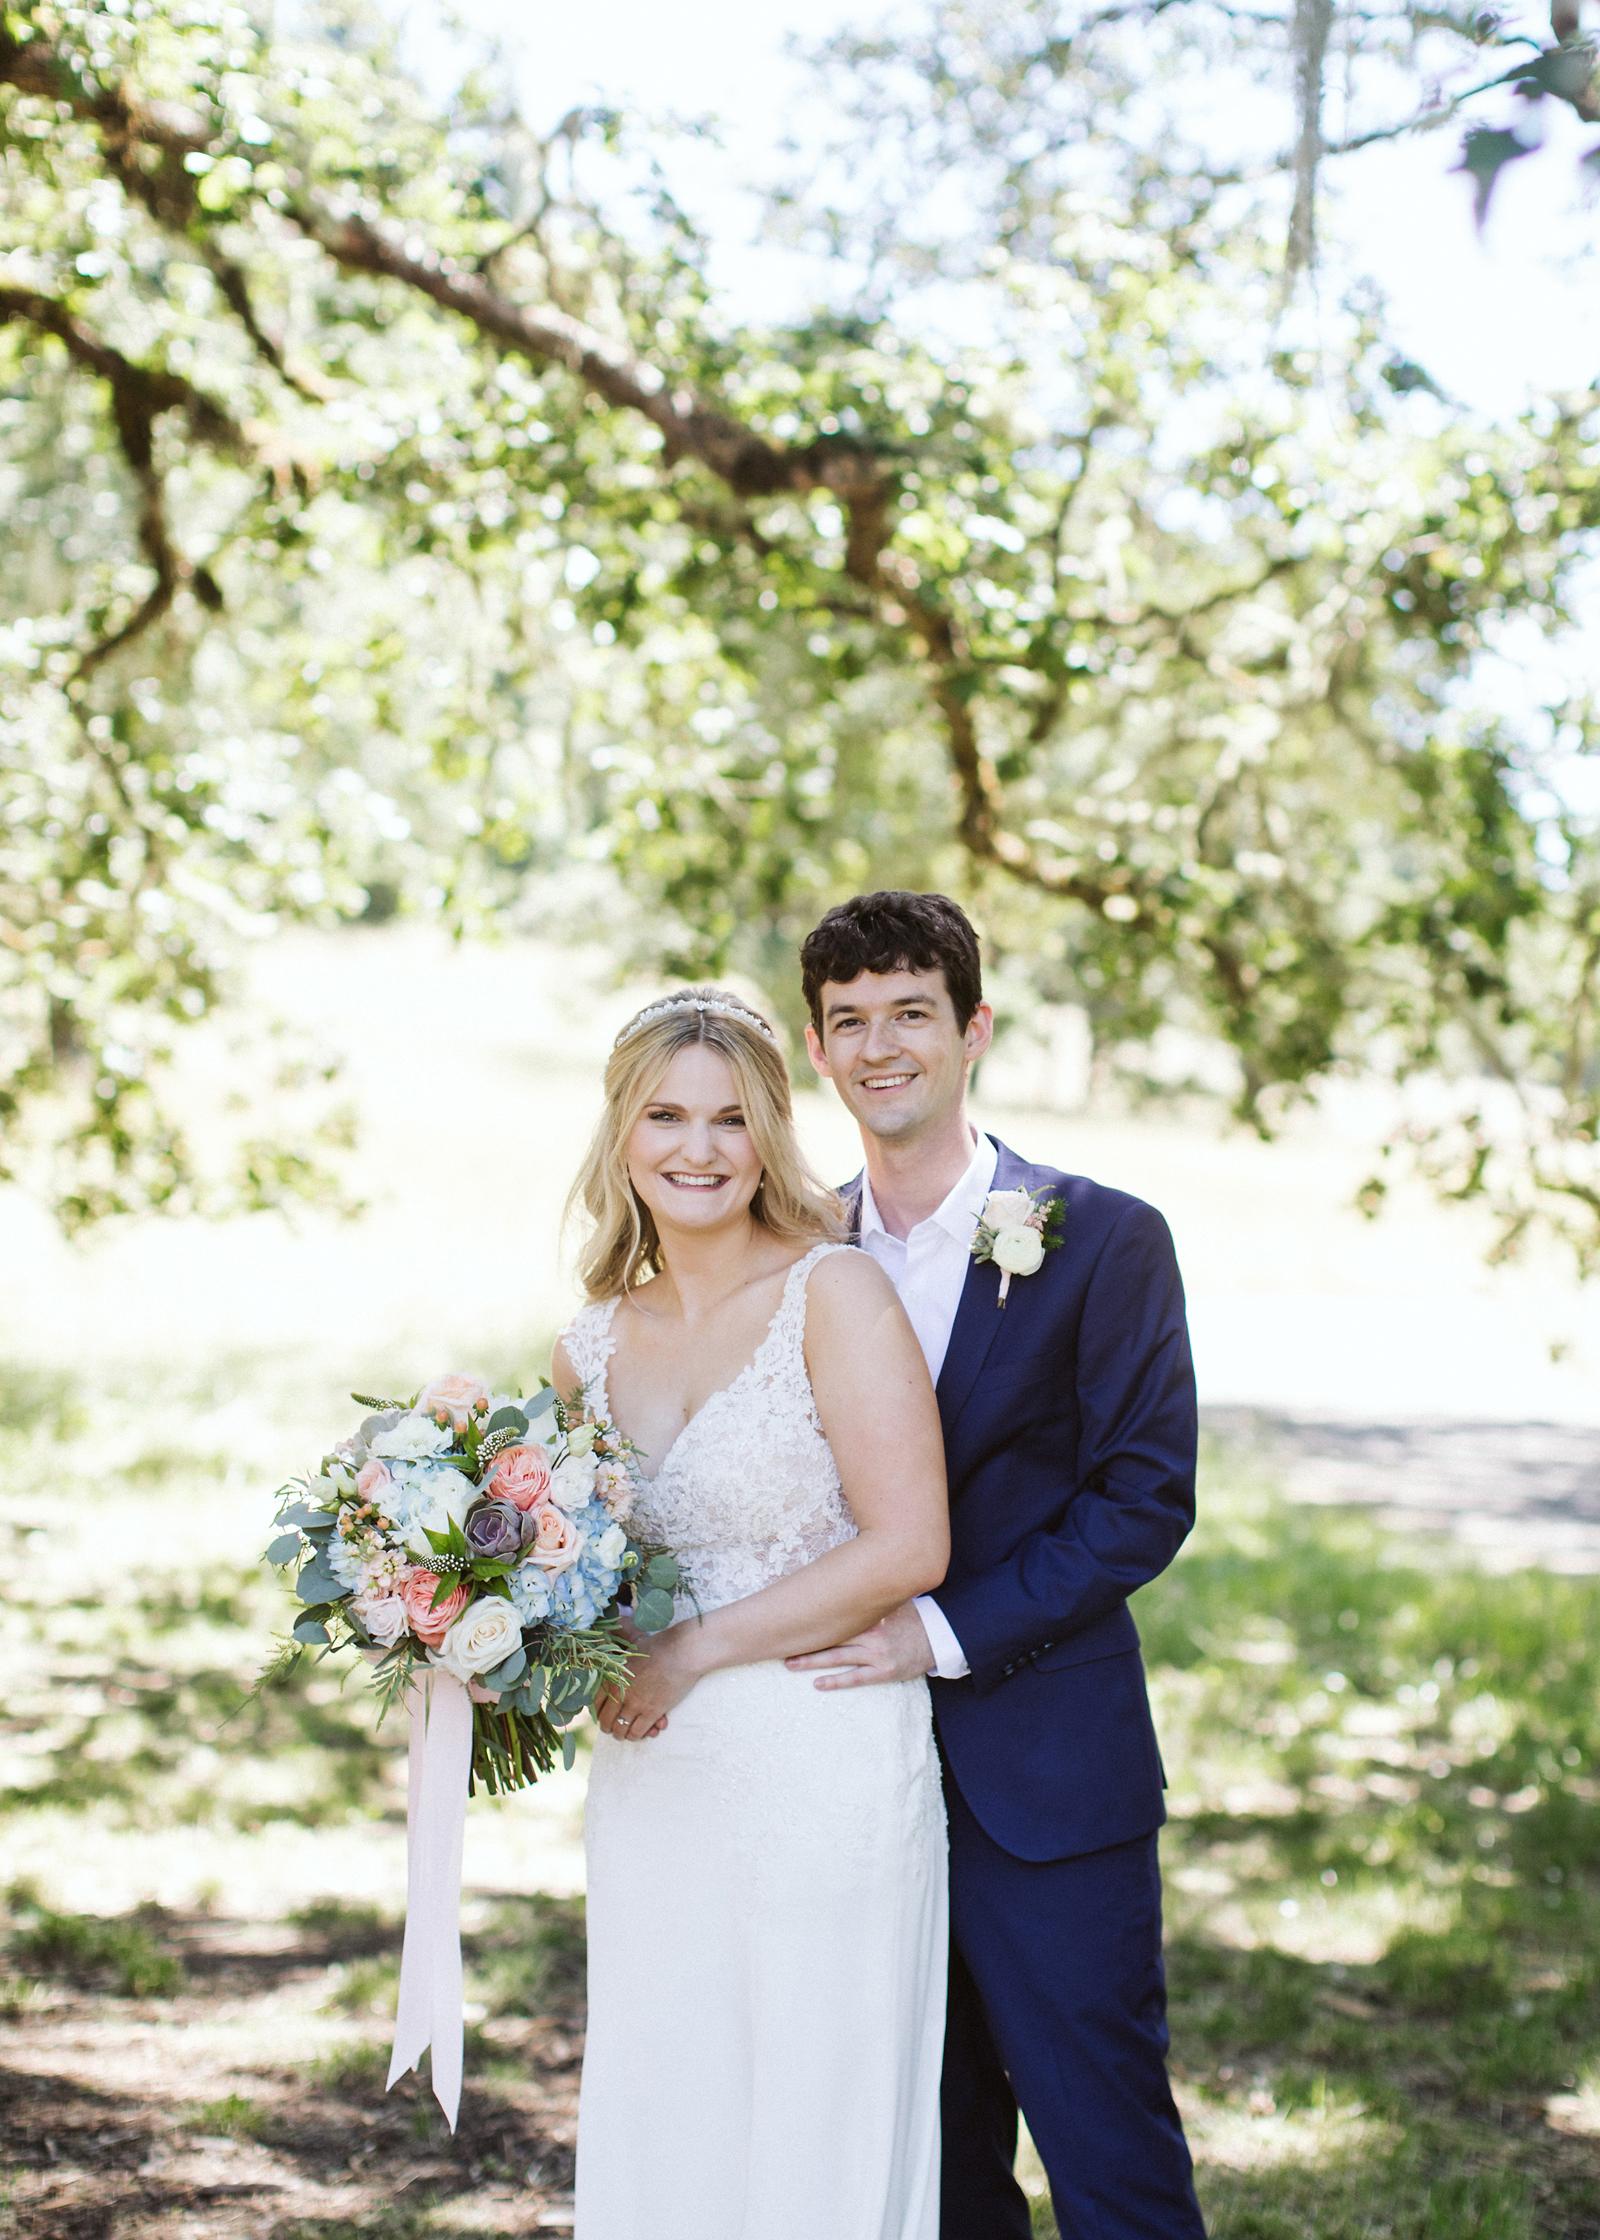 014-daronjackson-rachel-michael-wedding-mtpisgah.jpg